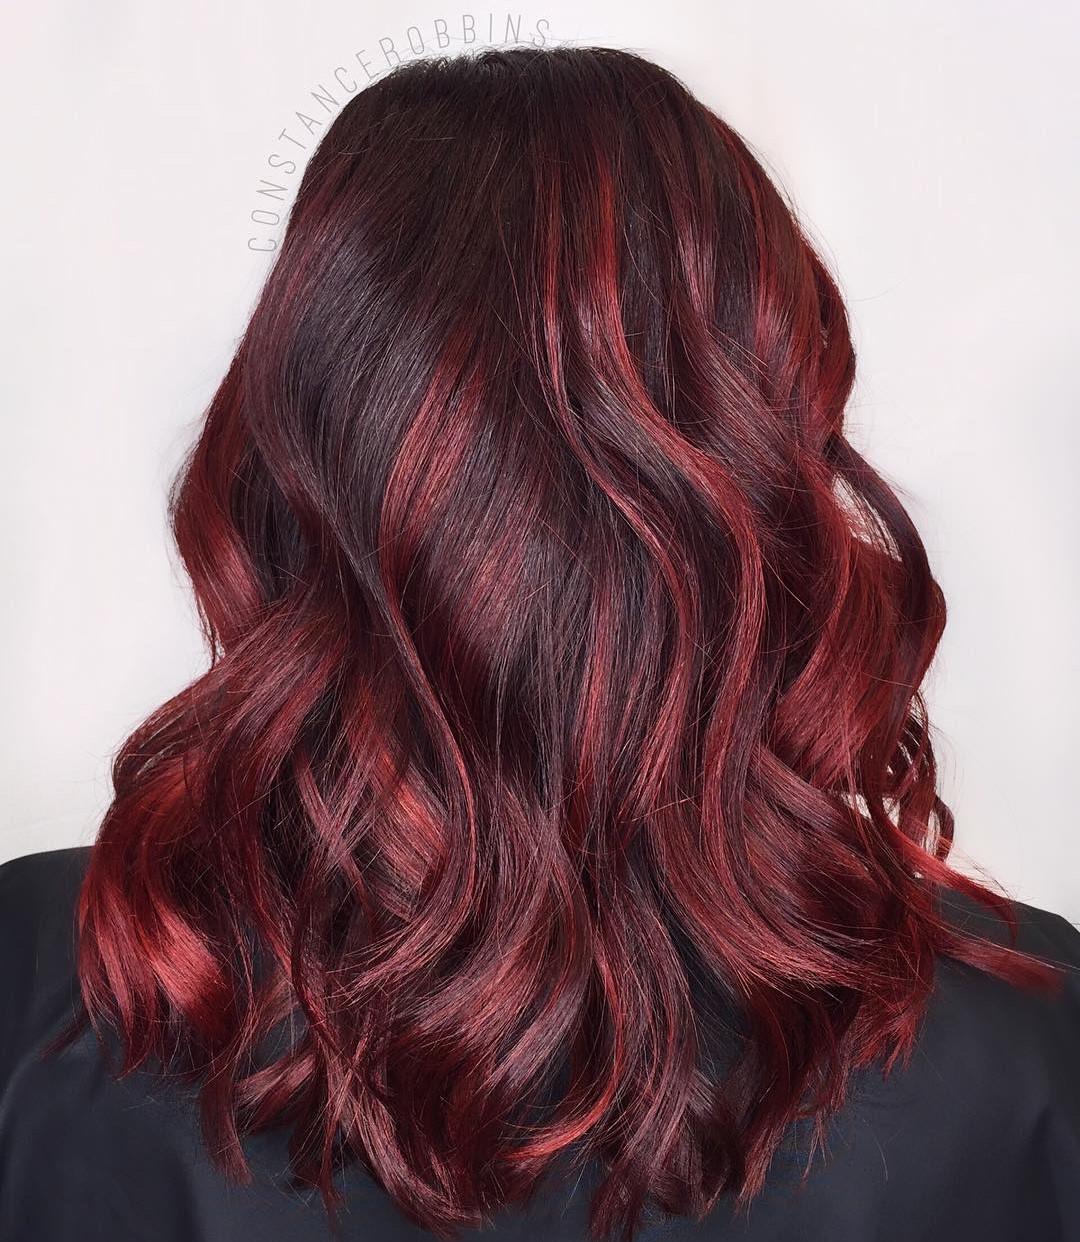 Maroon Burgundy Balayage for Dark Hair